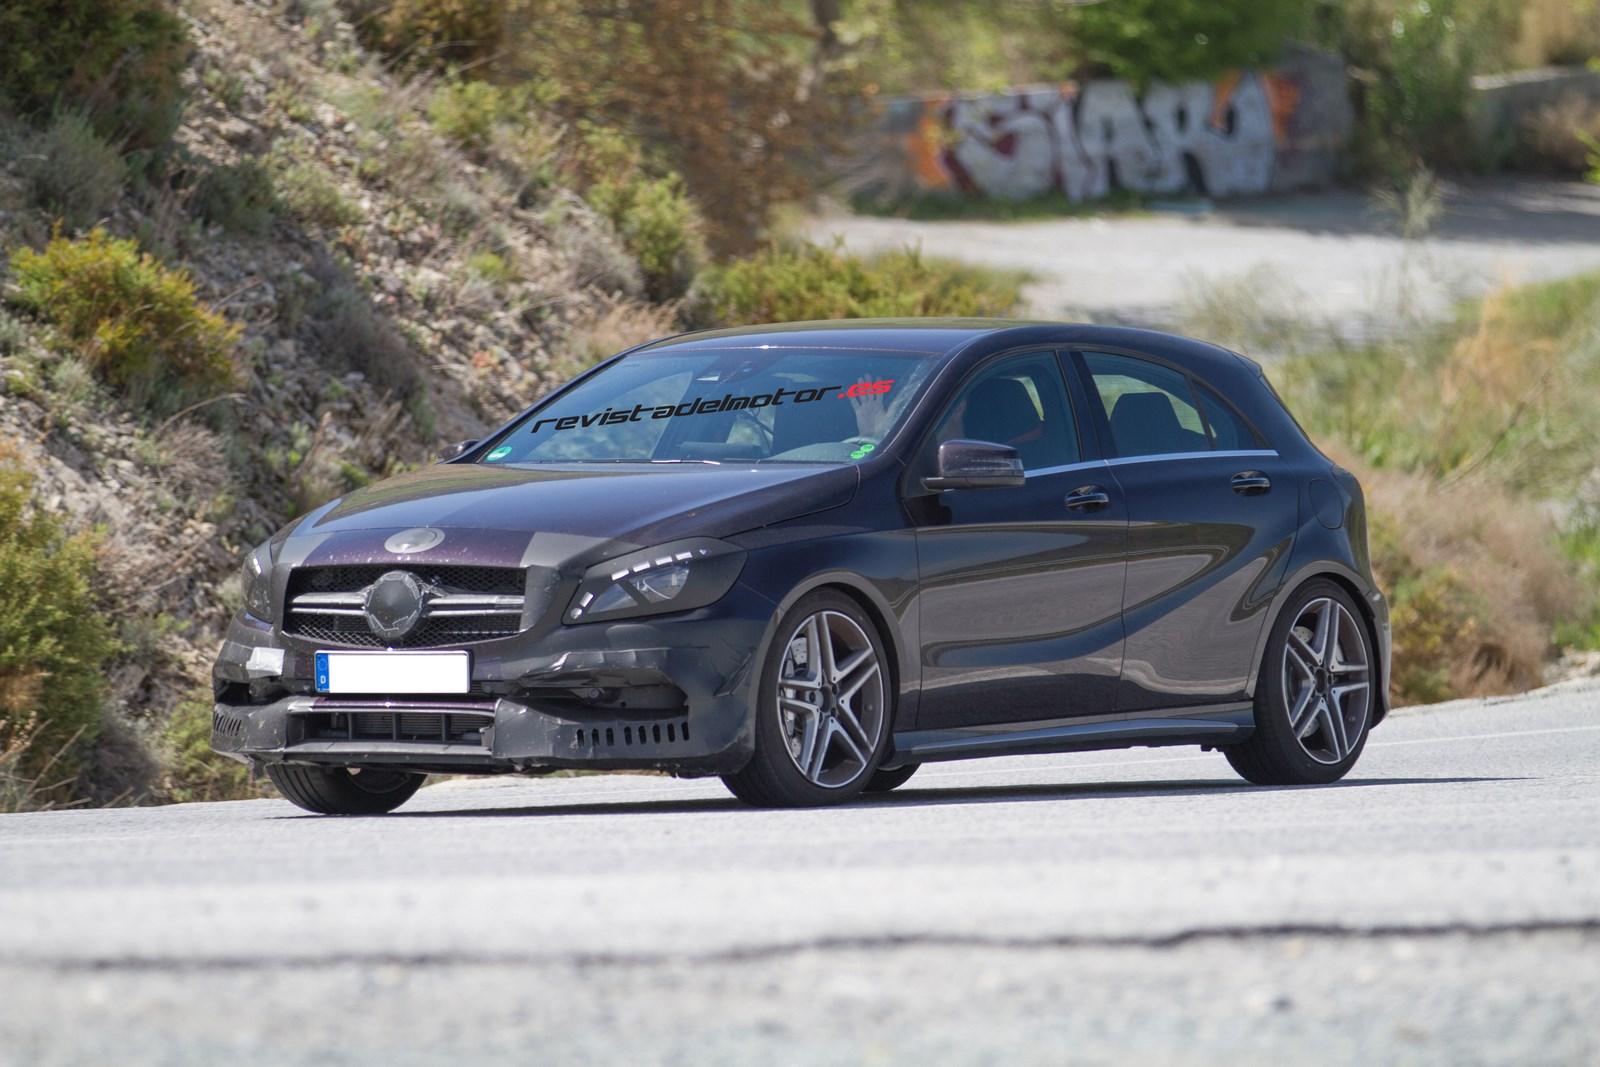 Mercedes-Benz prueba el lavado de cara del A 45 AMG